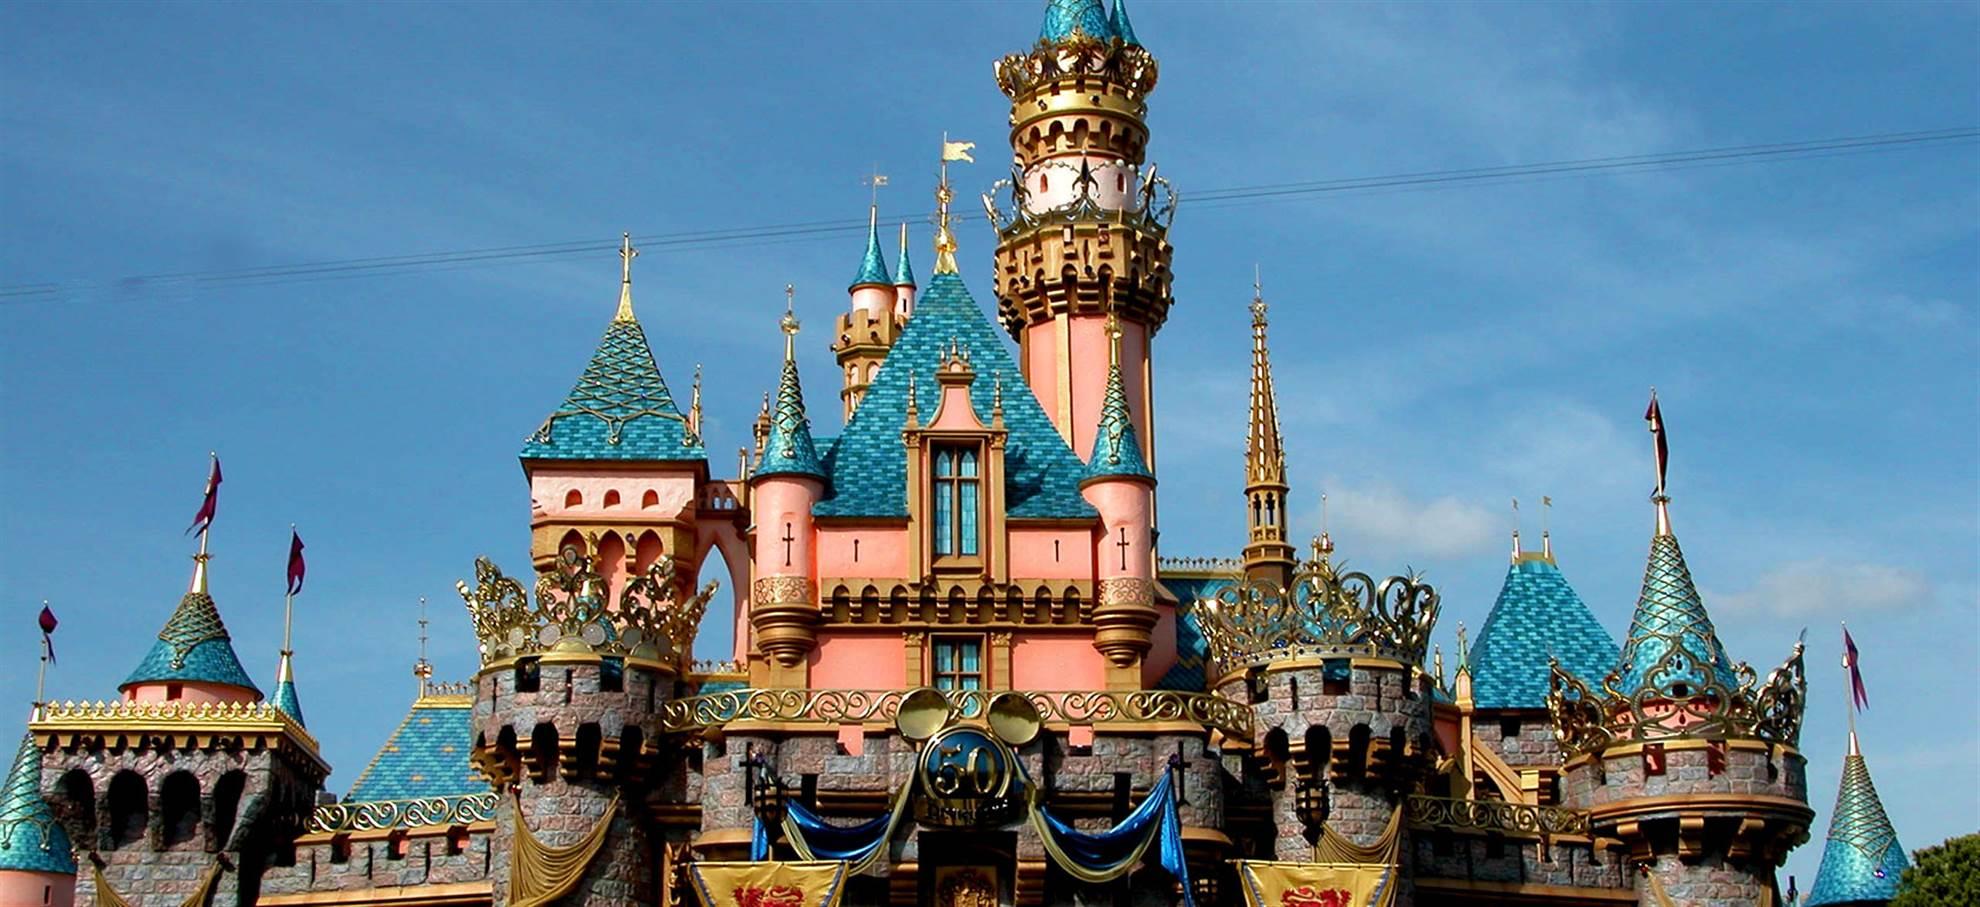 Disneyland Paris 1 Dia 2 Parques com Transporte